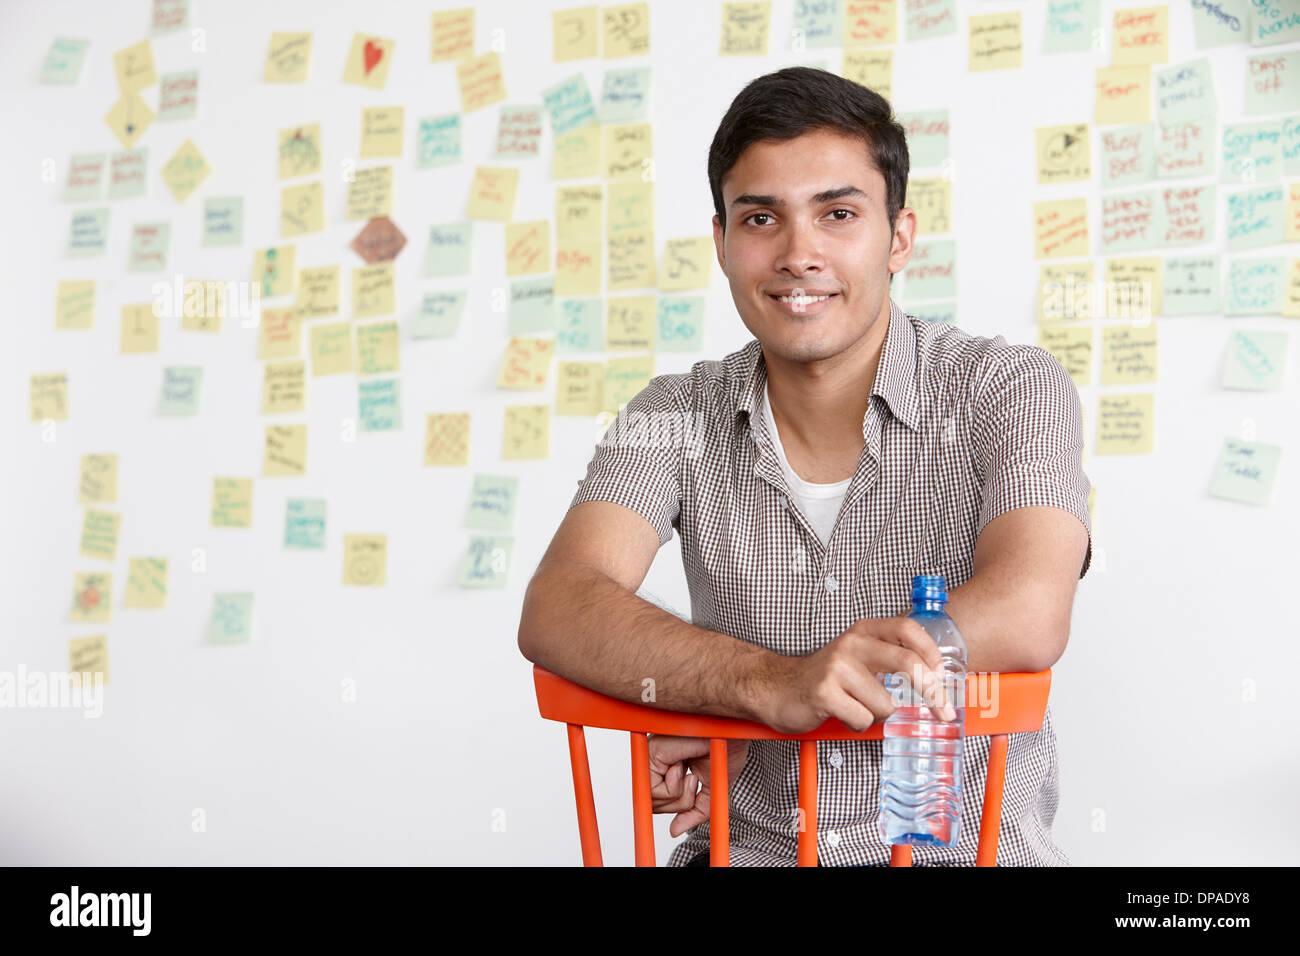 Retrato de joven con notas adhesivas en segundo plano. Imagen De Stock